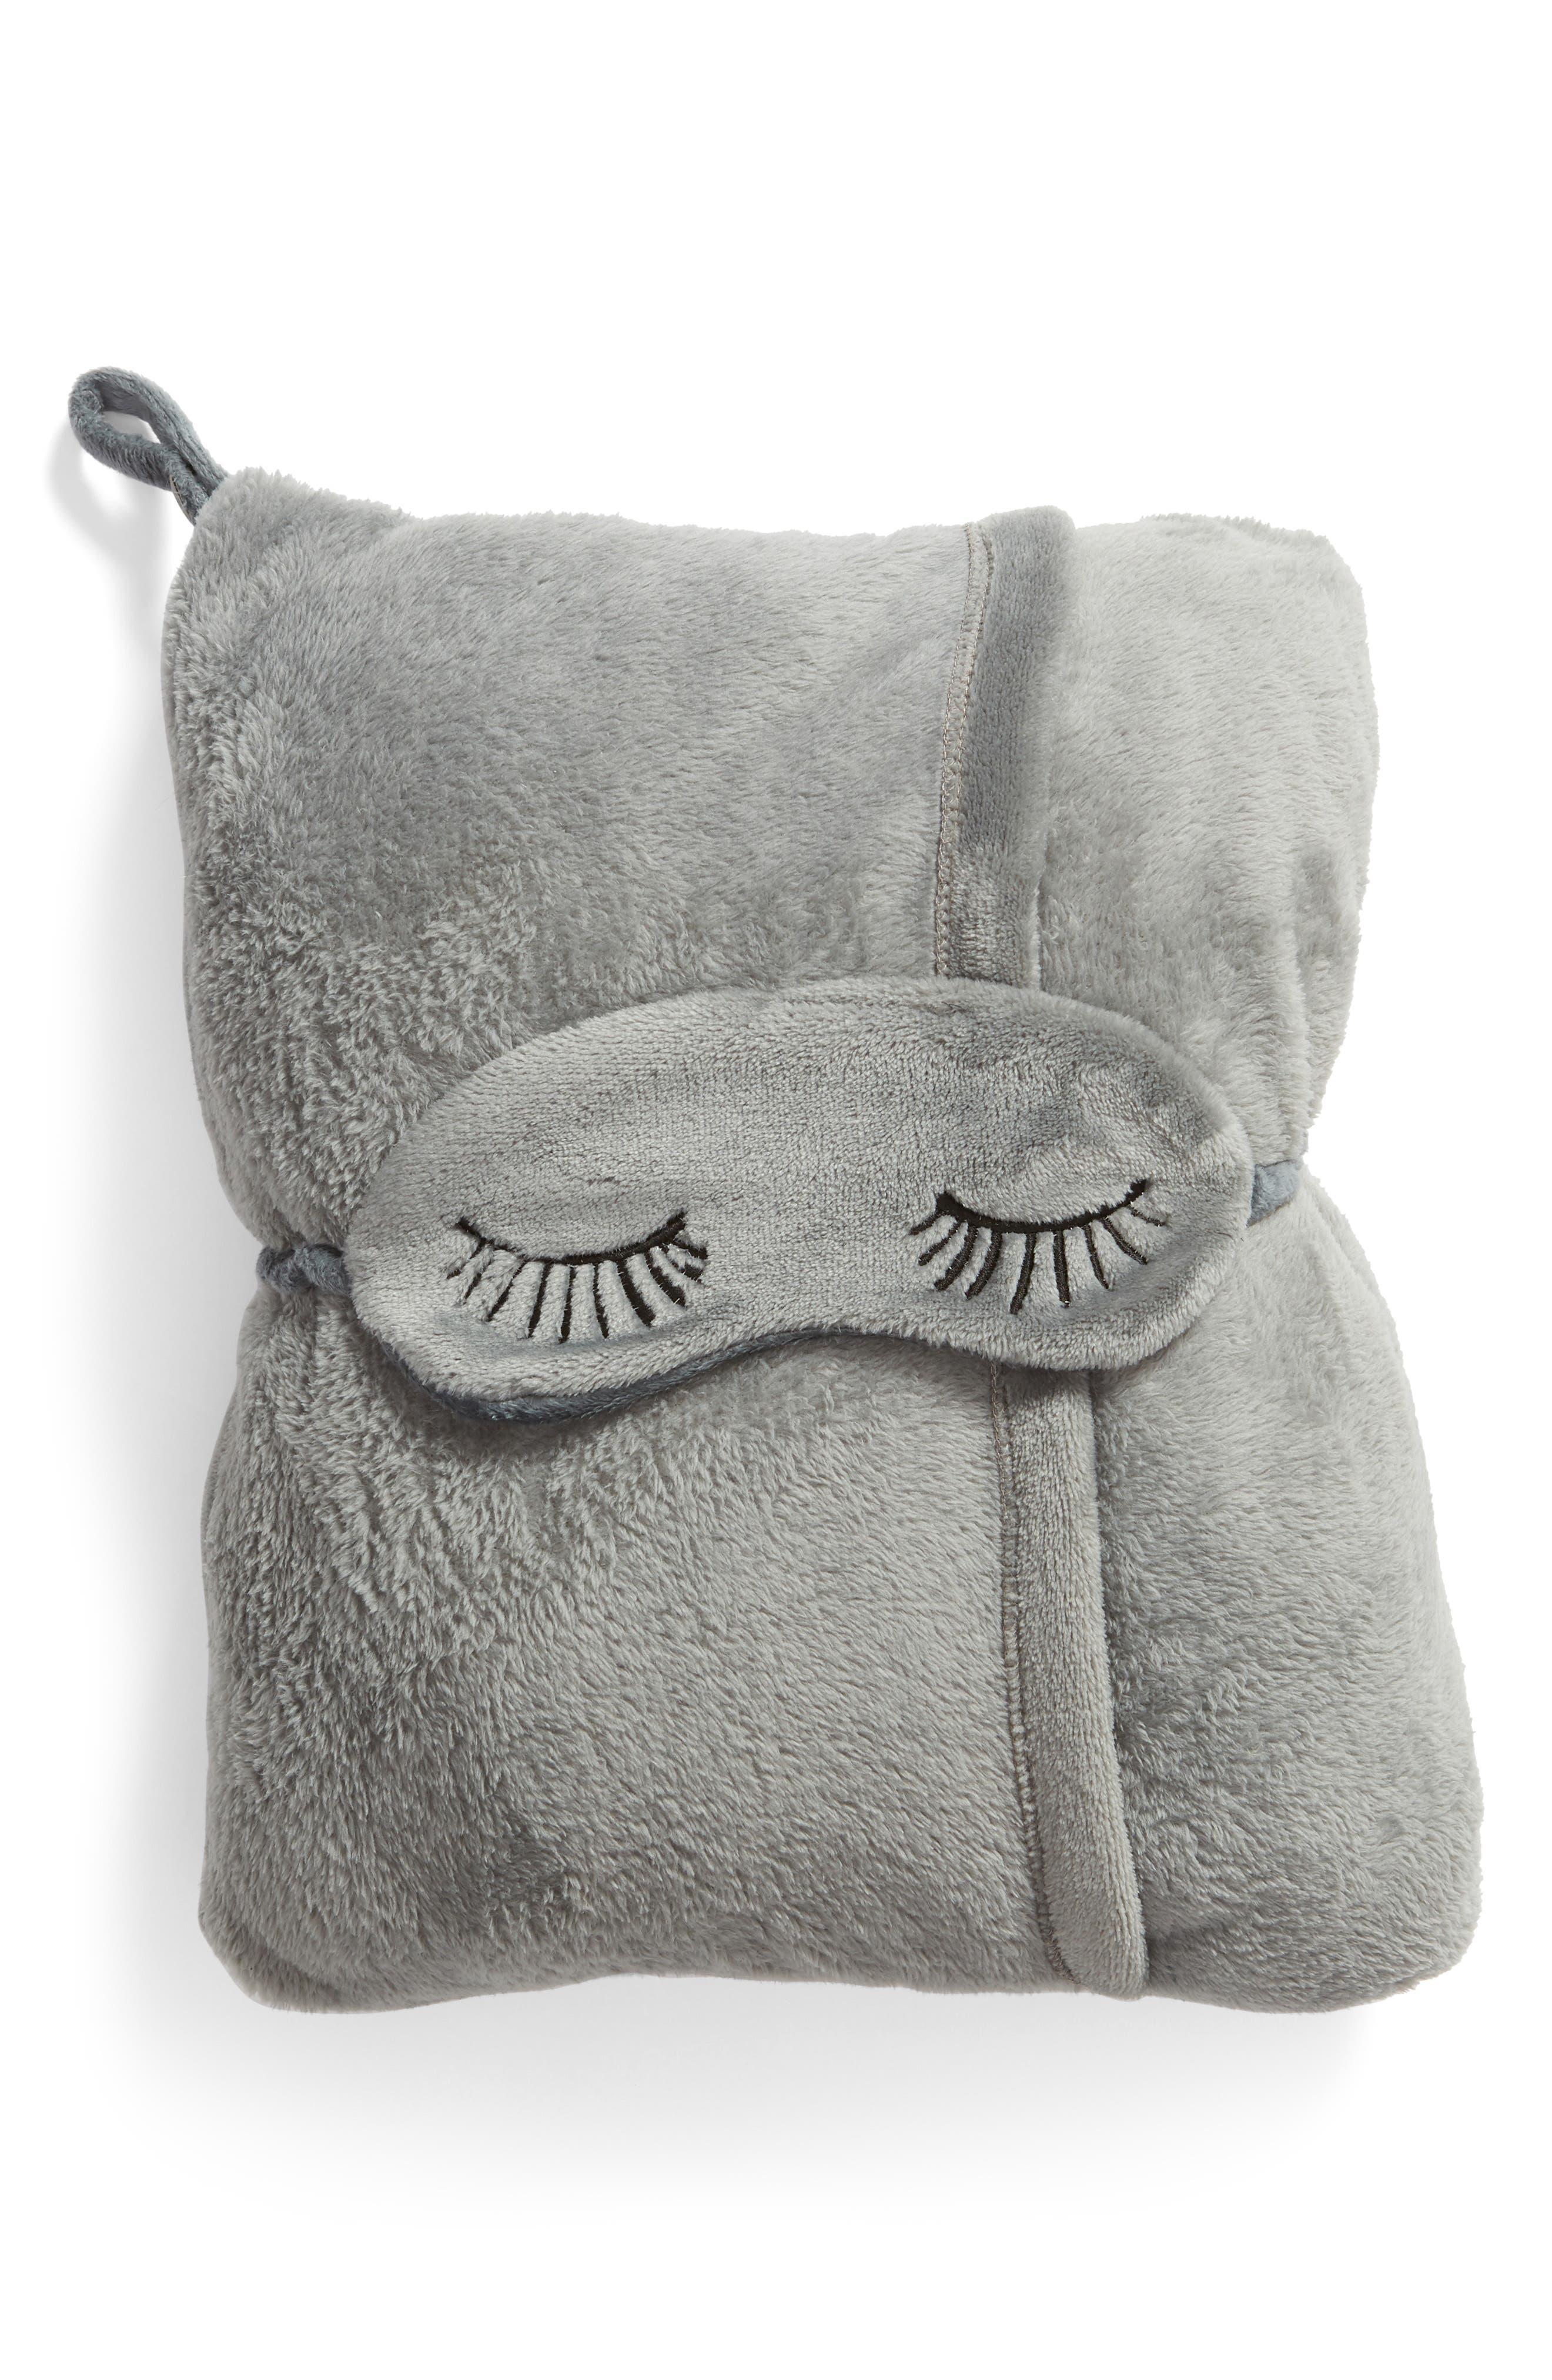 Eye Mask & Travel Blanket,                             Main thumbnail 1, color,                             GREY VAPOR